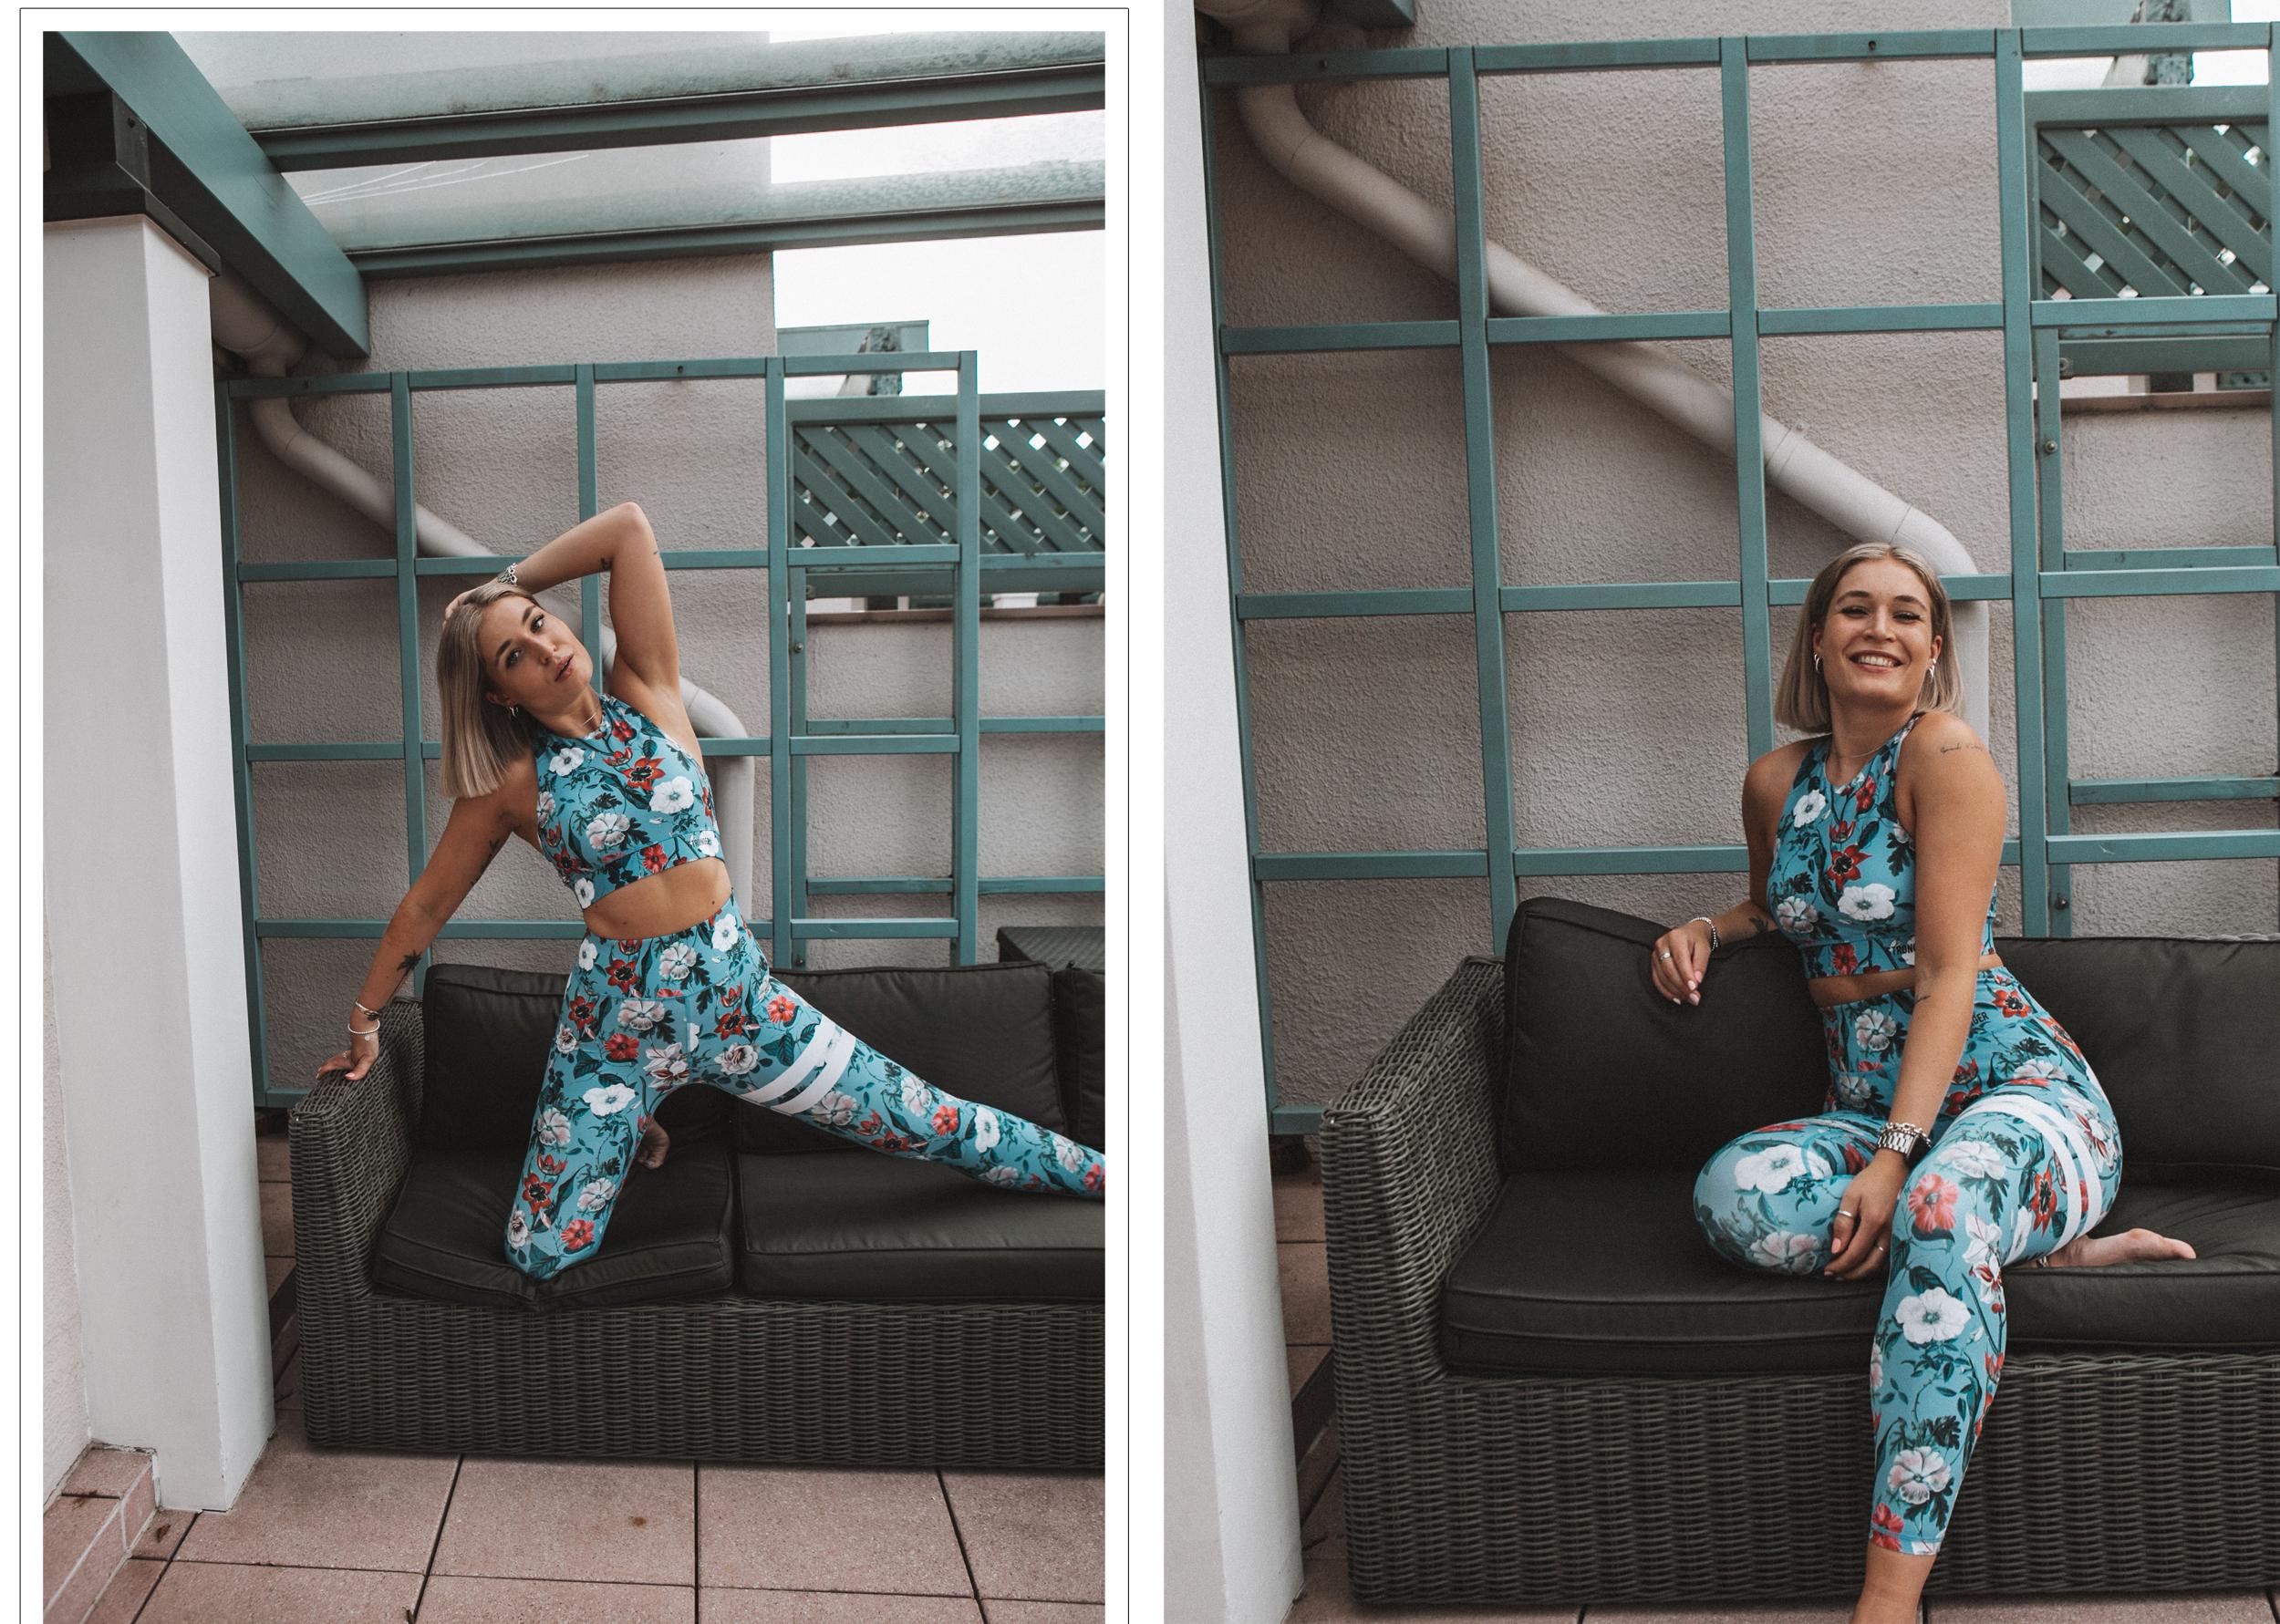 lauralamode-yoga-workout-yoga erfahrungen-yoga wirkung-Gründe für yoga-fitness-fitnessblogger-blogger-fashionblogger-yogapractise-berlin-berlin blogger